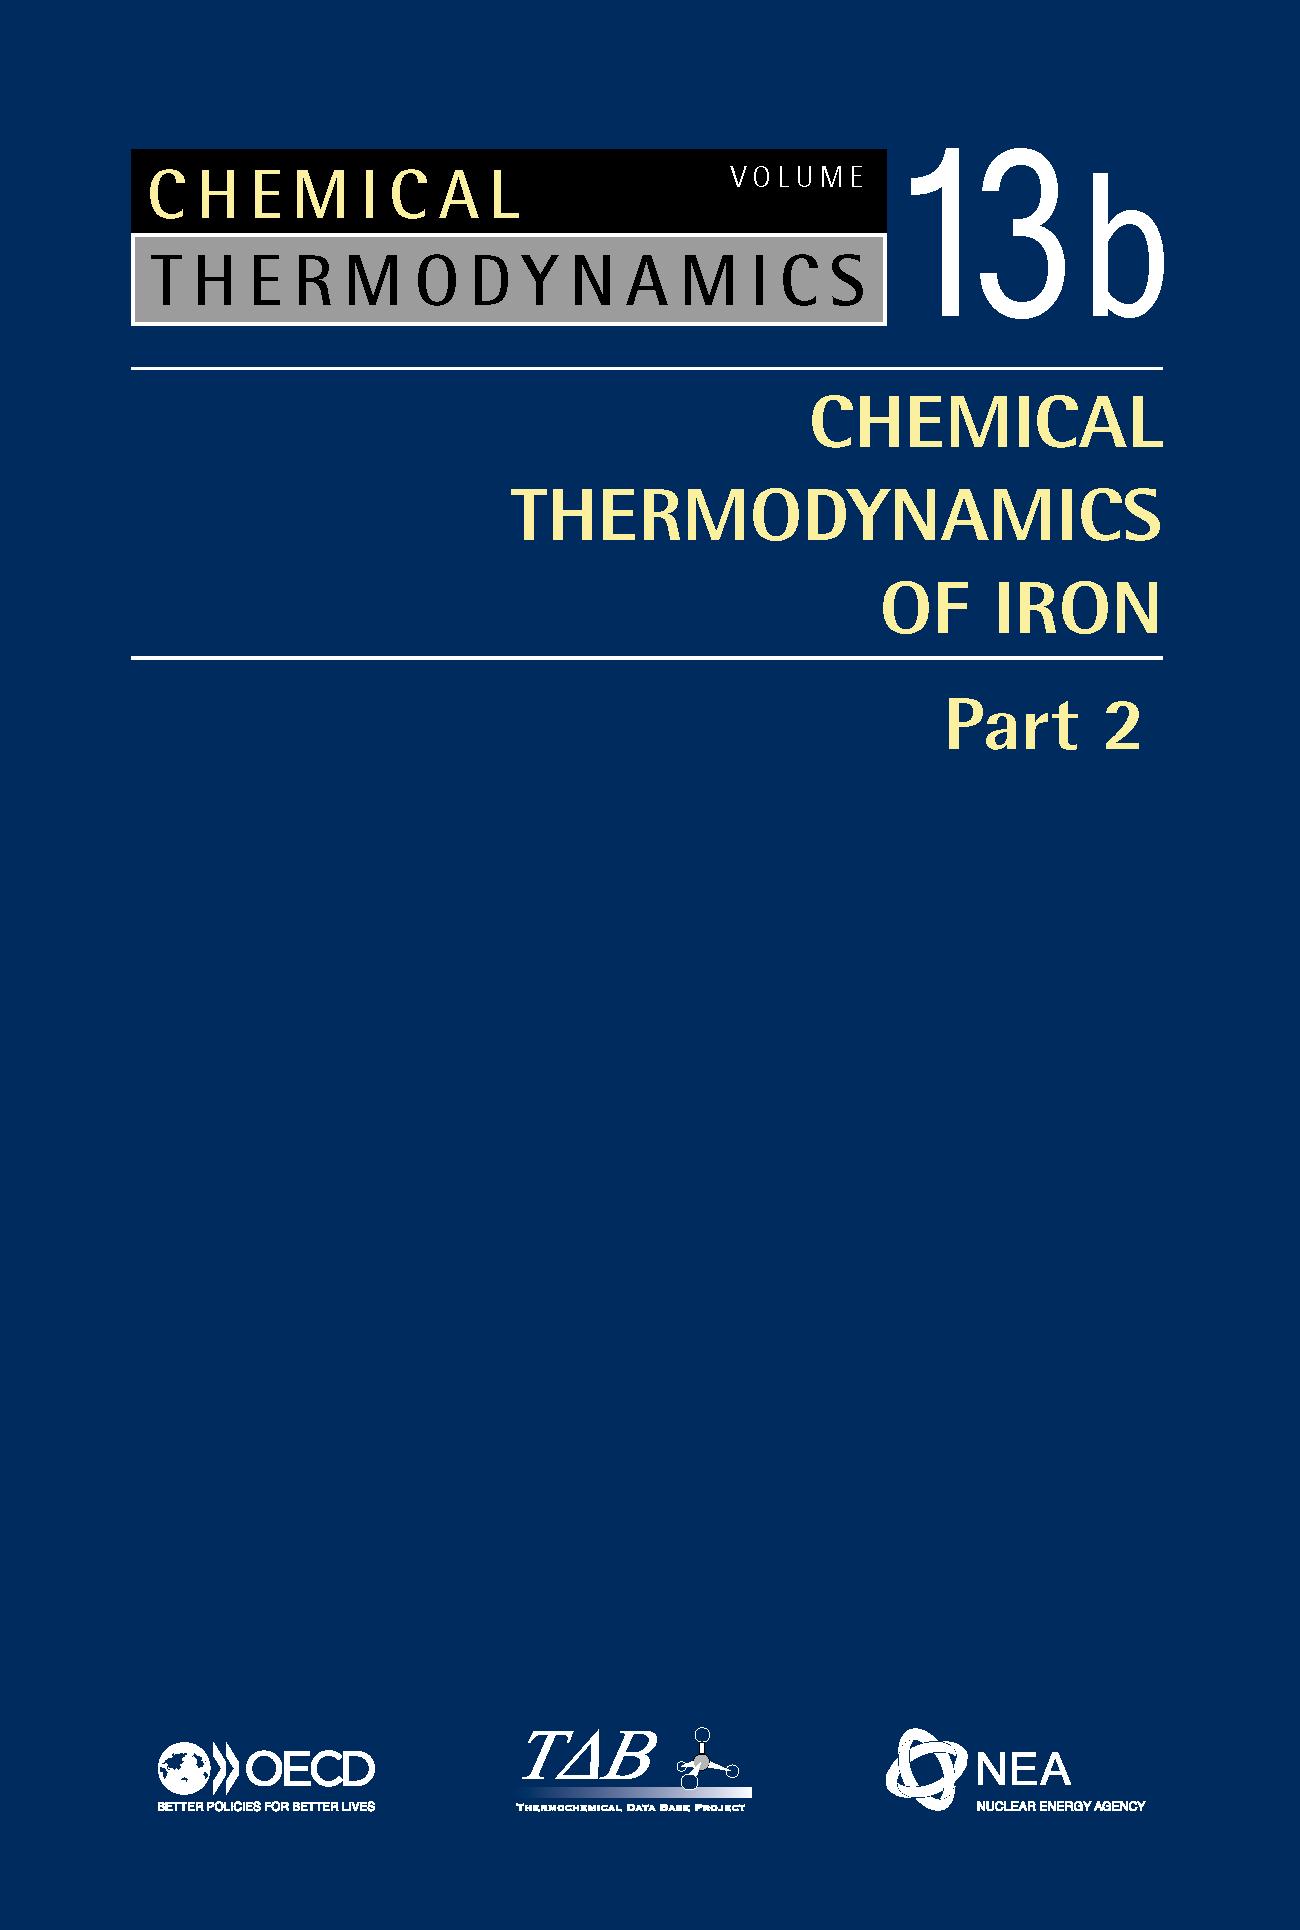 Chemical Thermodynamics Series Volume 13b; Chemical Thermodynamics of Iron, Part 2